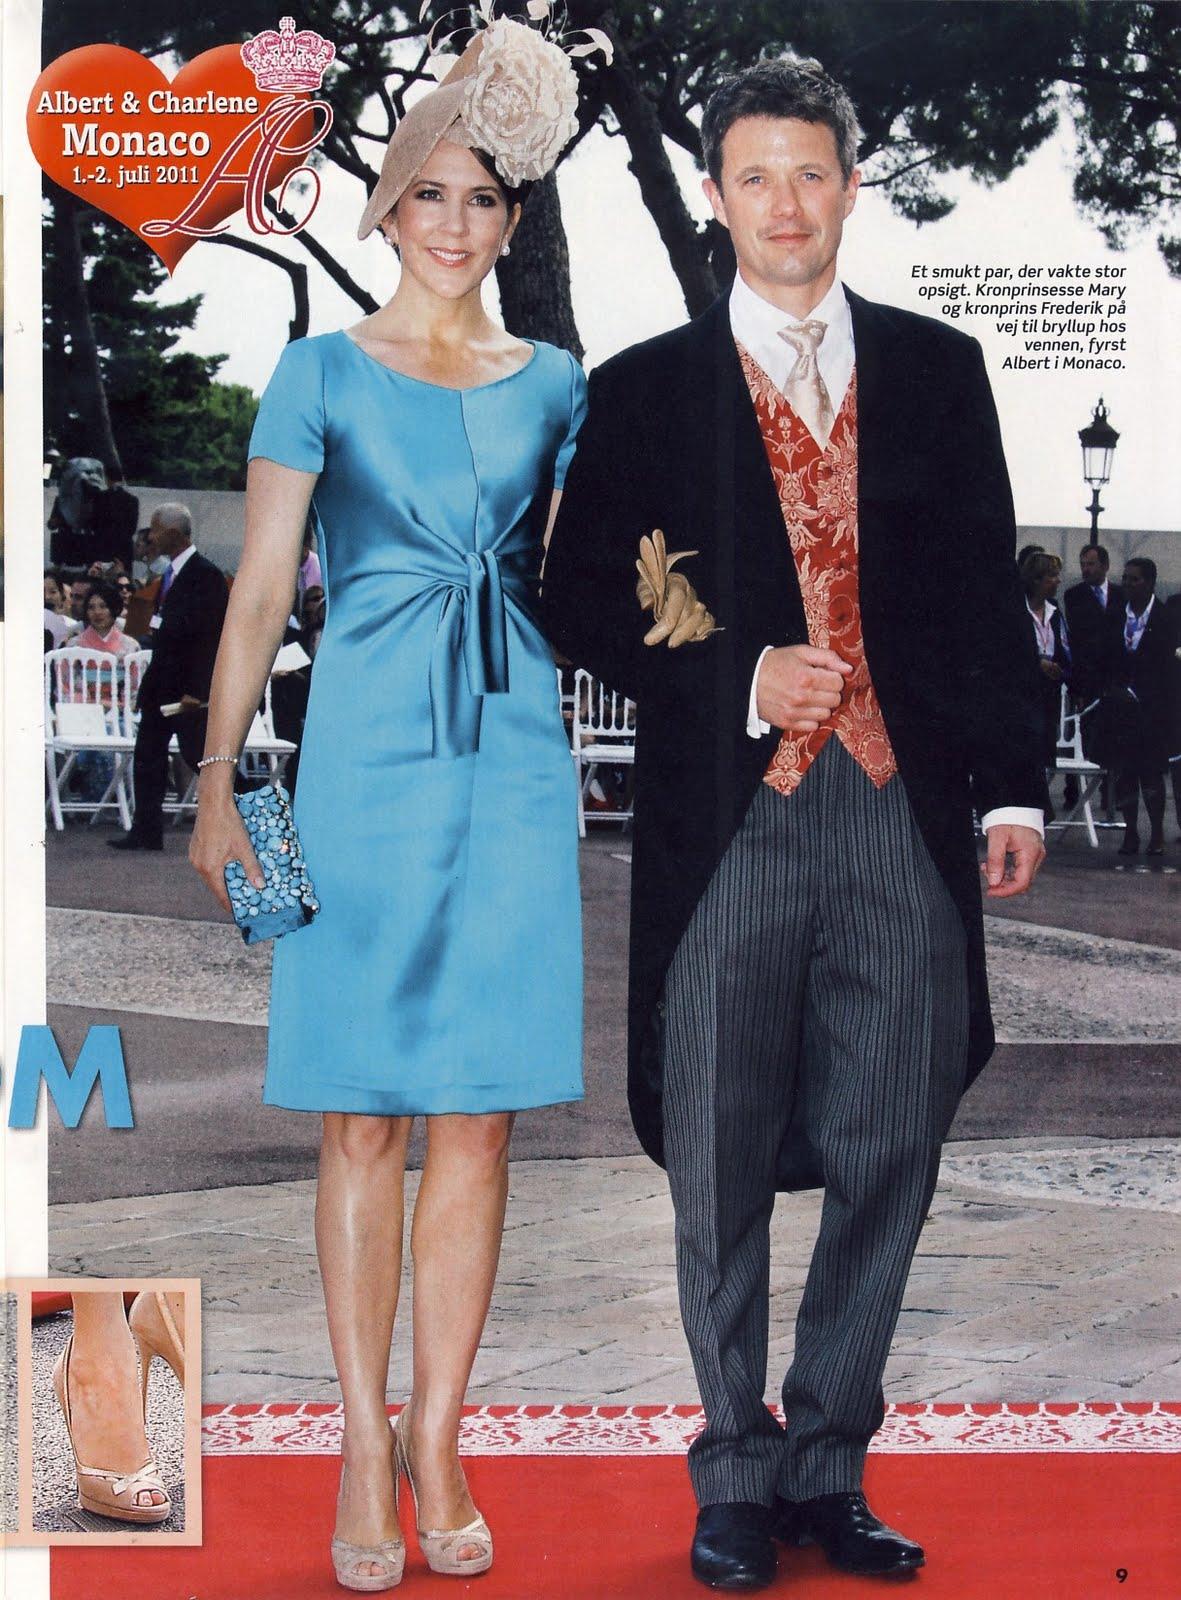 Danish Royal Media Watch: Billed Bladet #27: The Monaco Wedding